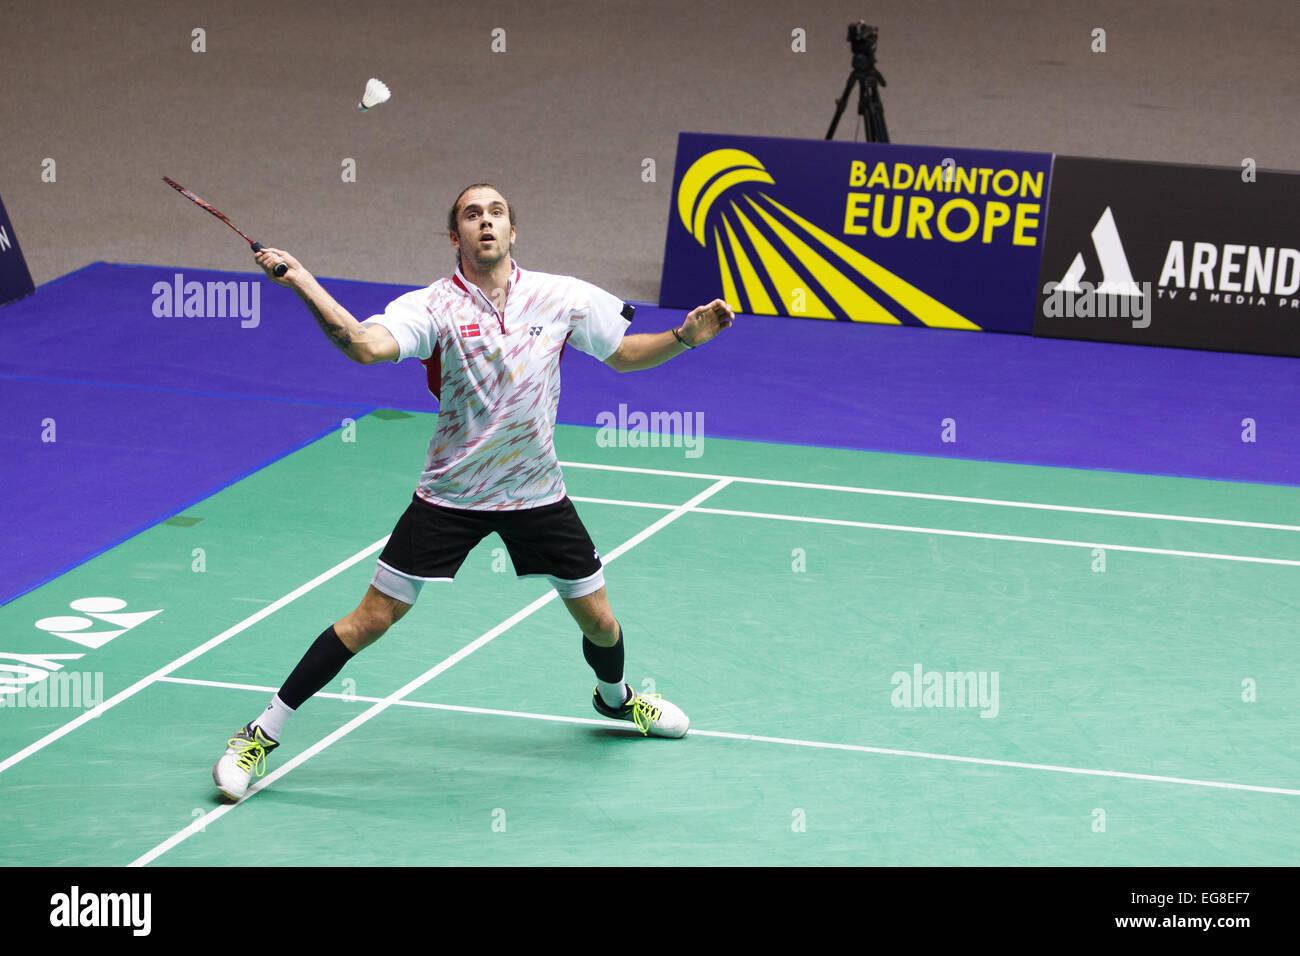 LEUVEN, BELGIUM, 15/02/2015. Badminton player Jan O Jorgensen (Denmark, pictured) beats Toby Penty (England) in - Stock Image